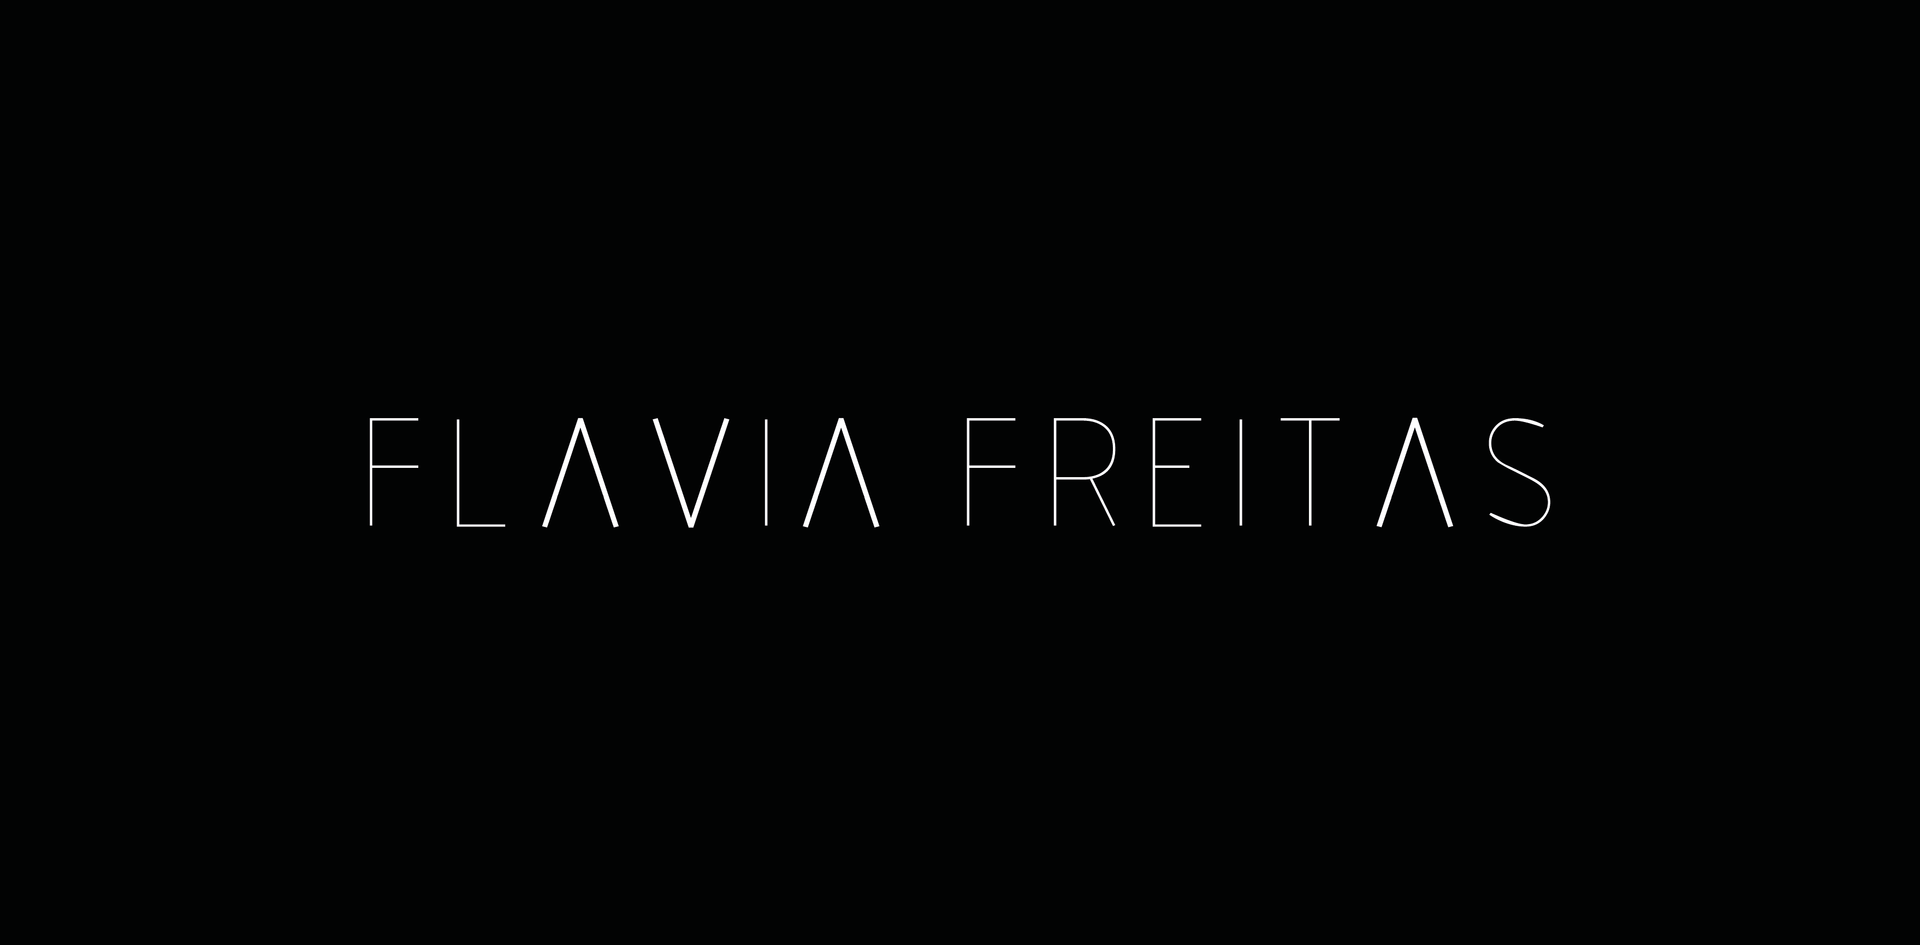 Flavia Freitas marca fundo preto-02.png